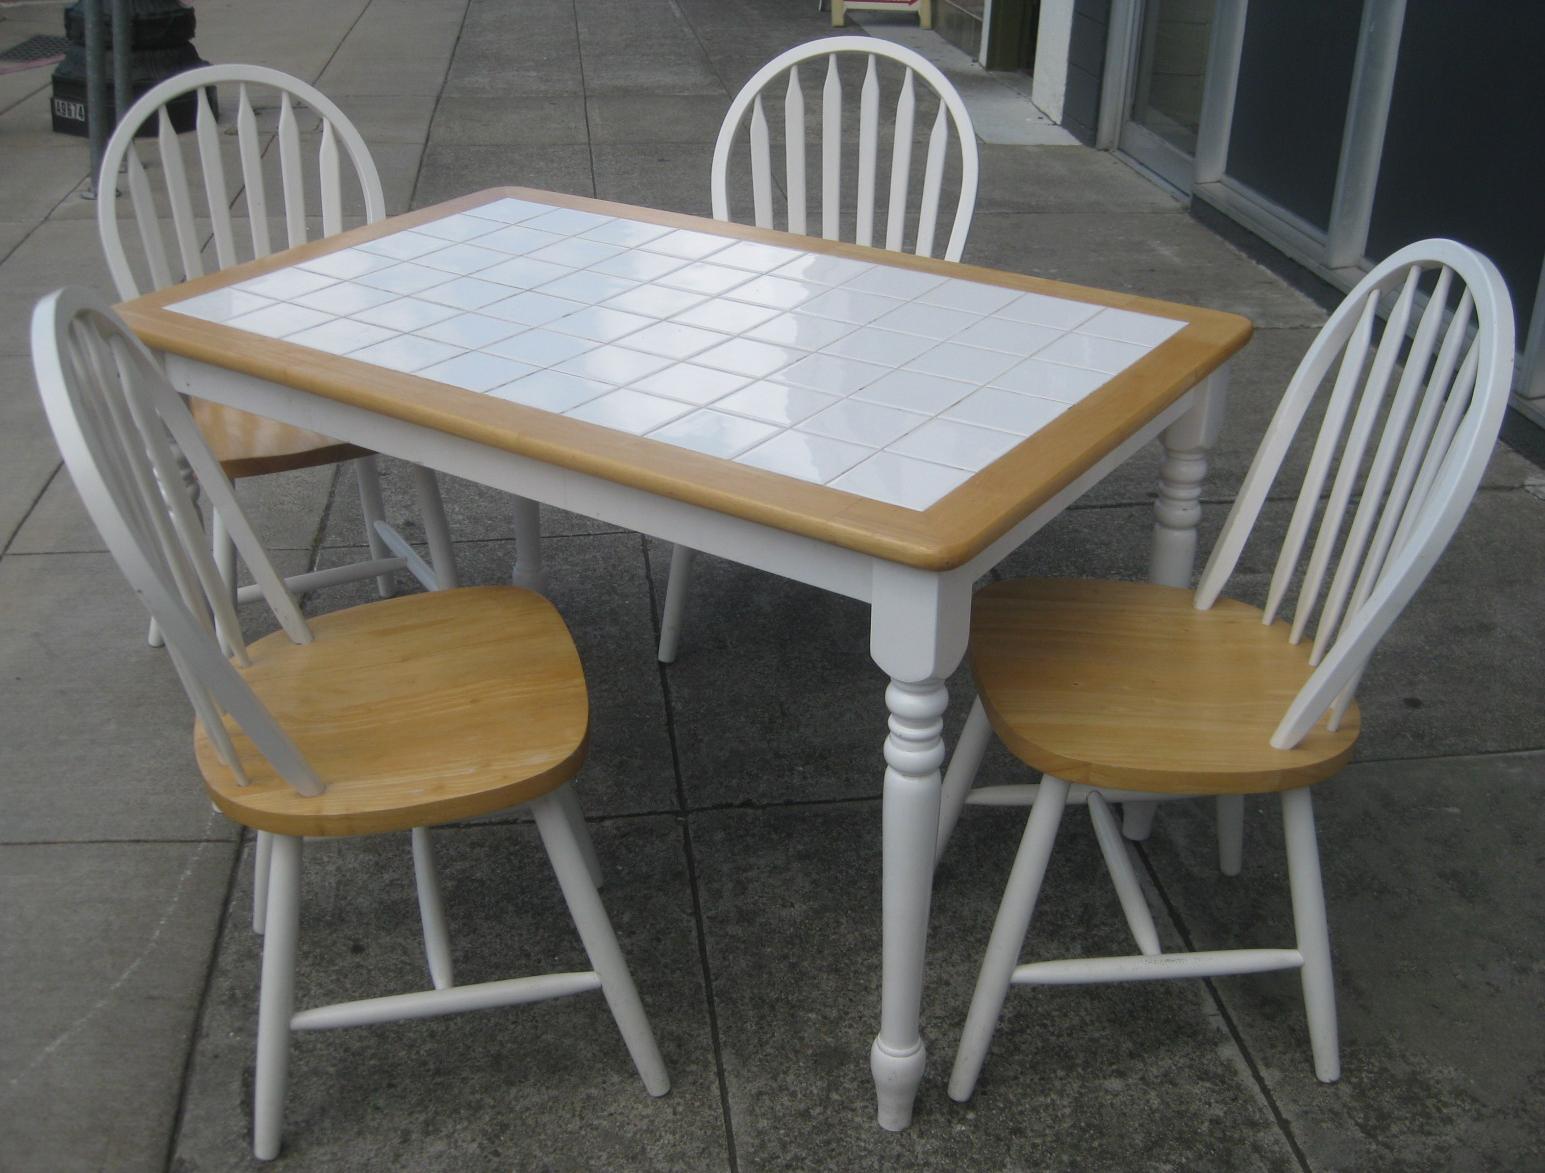 Tile top kitchen tables photo - 3